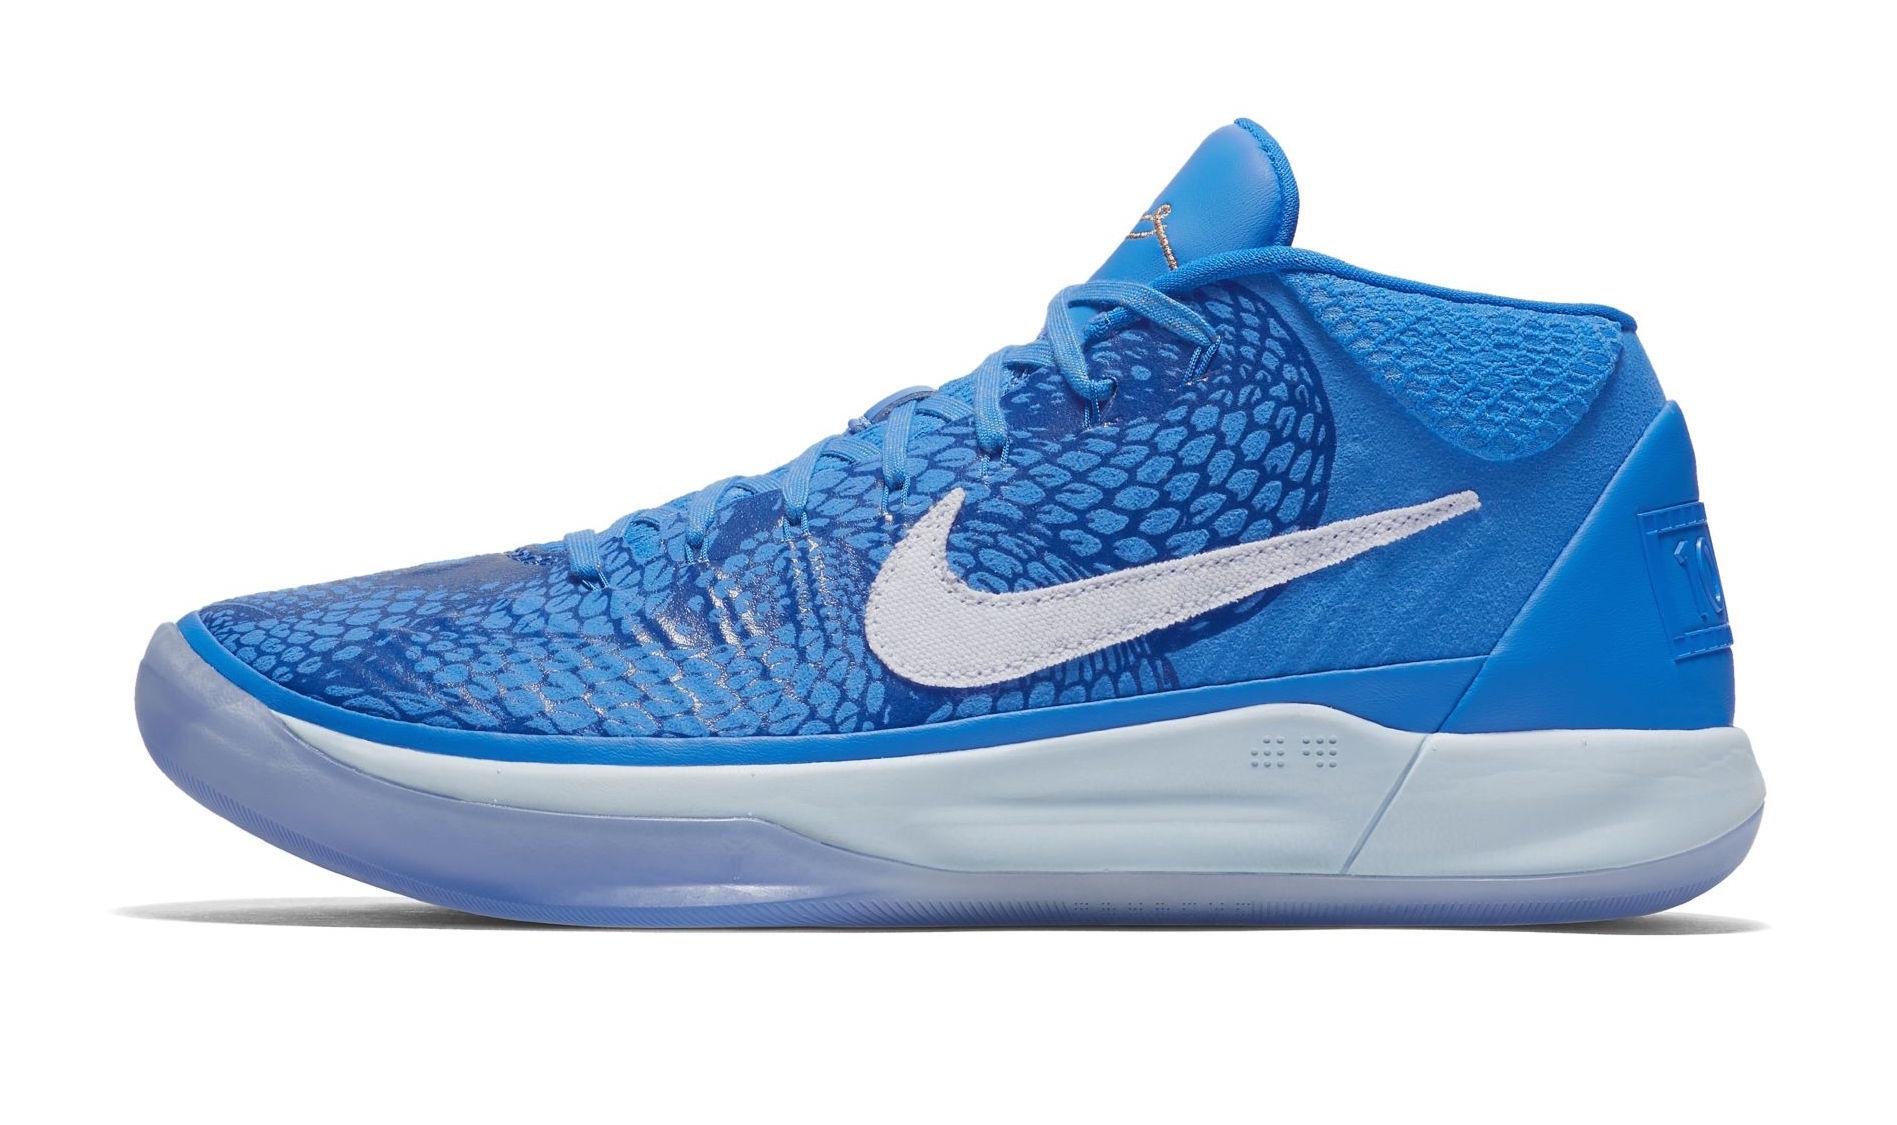 Nike Kobe A.D. Mid DeMar DeRozan PE